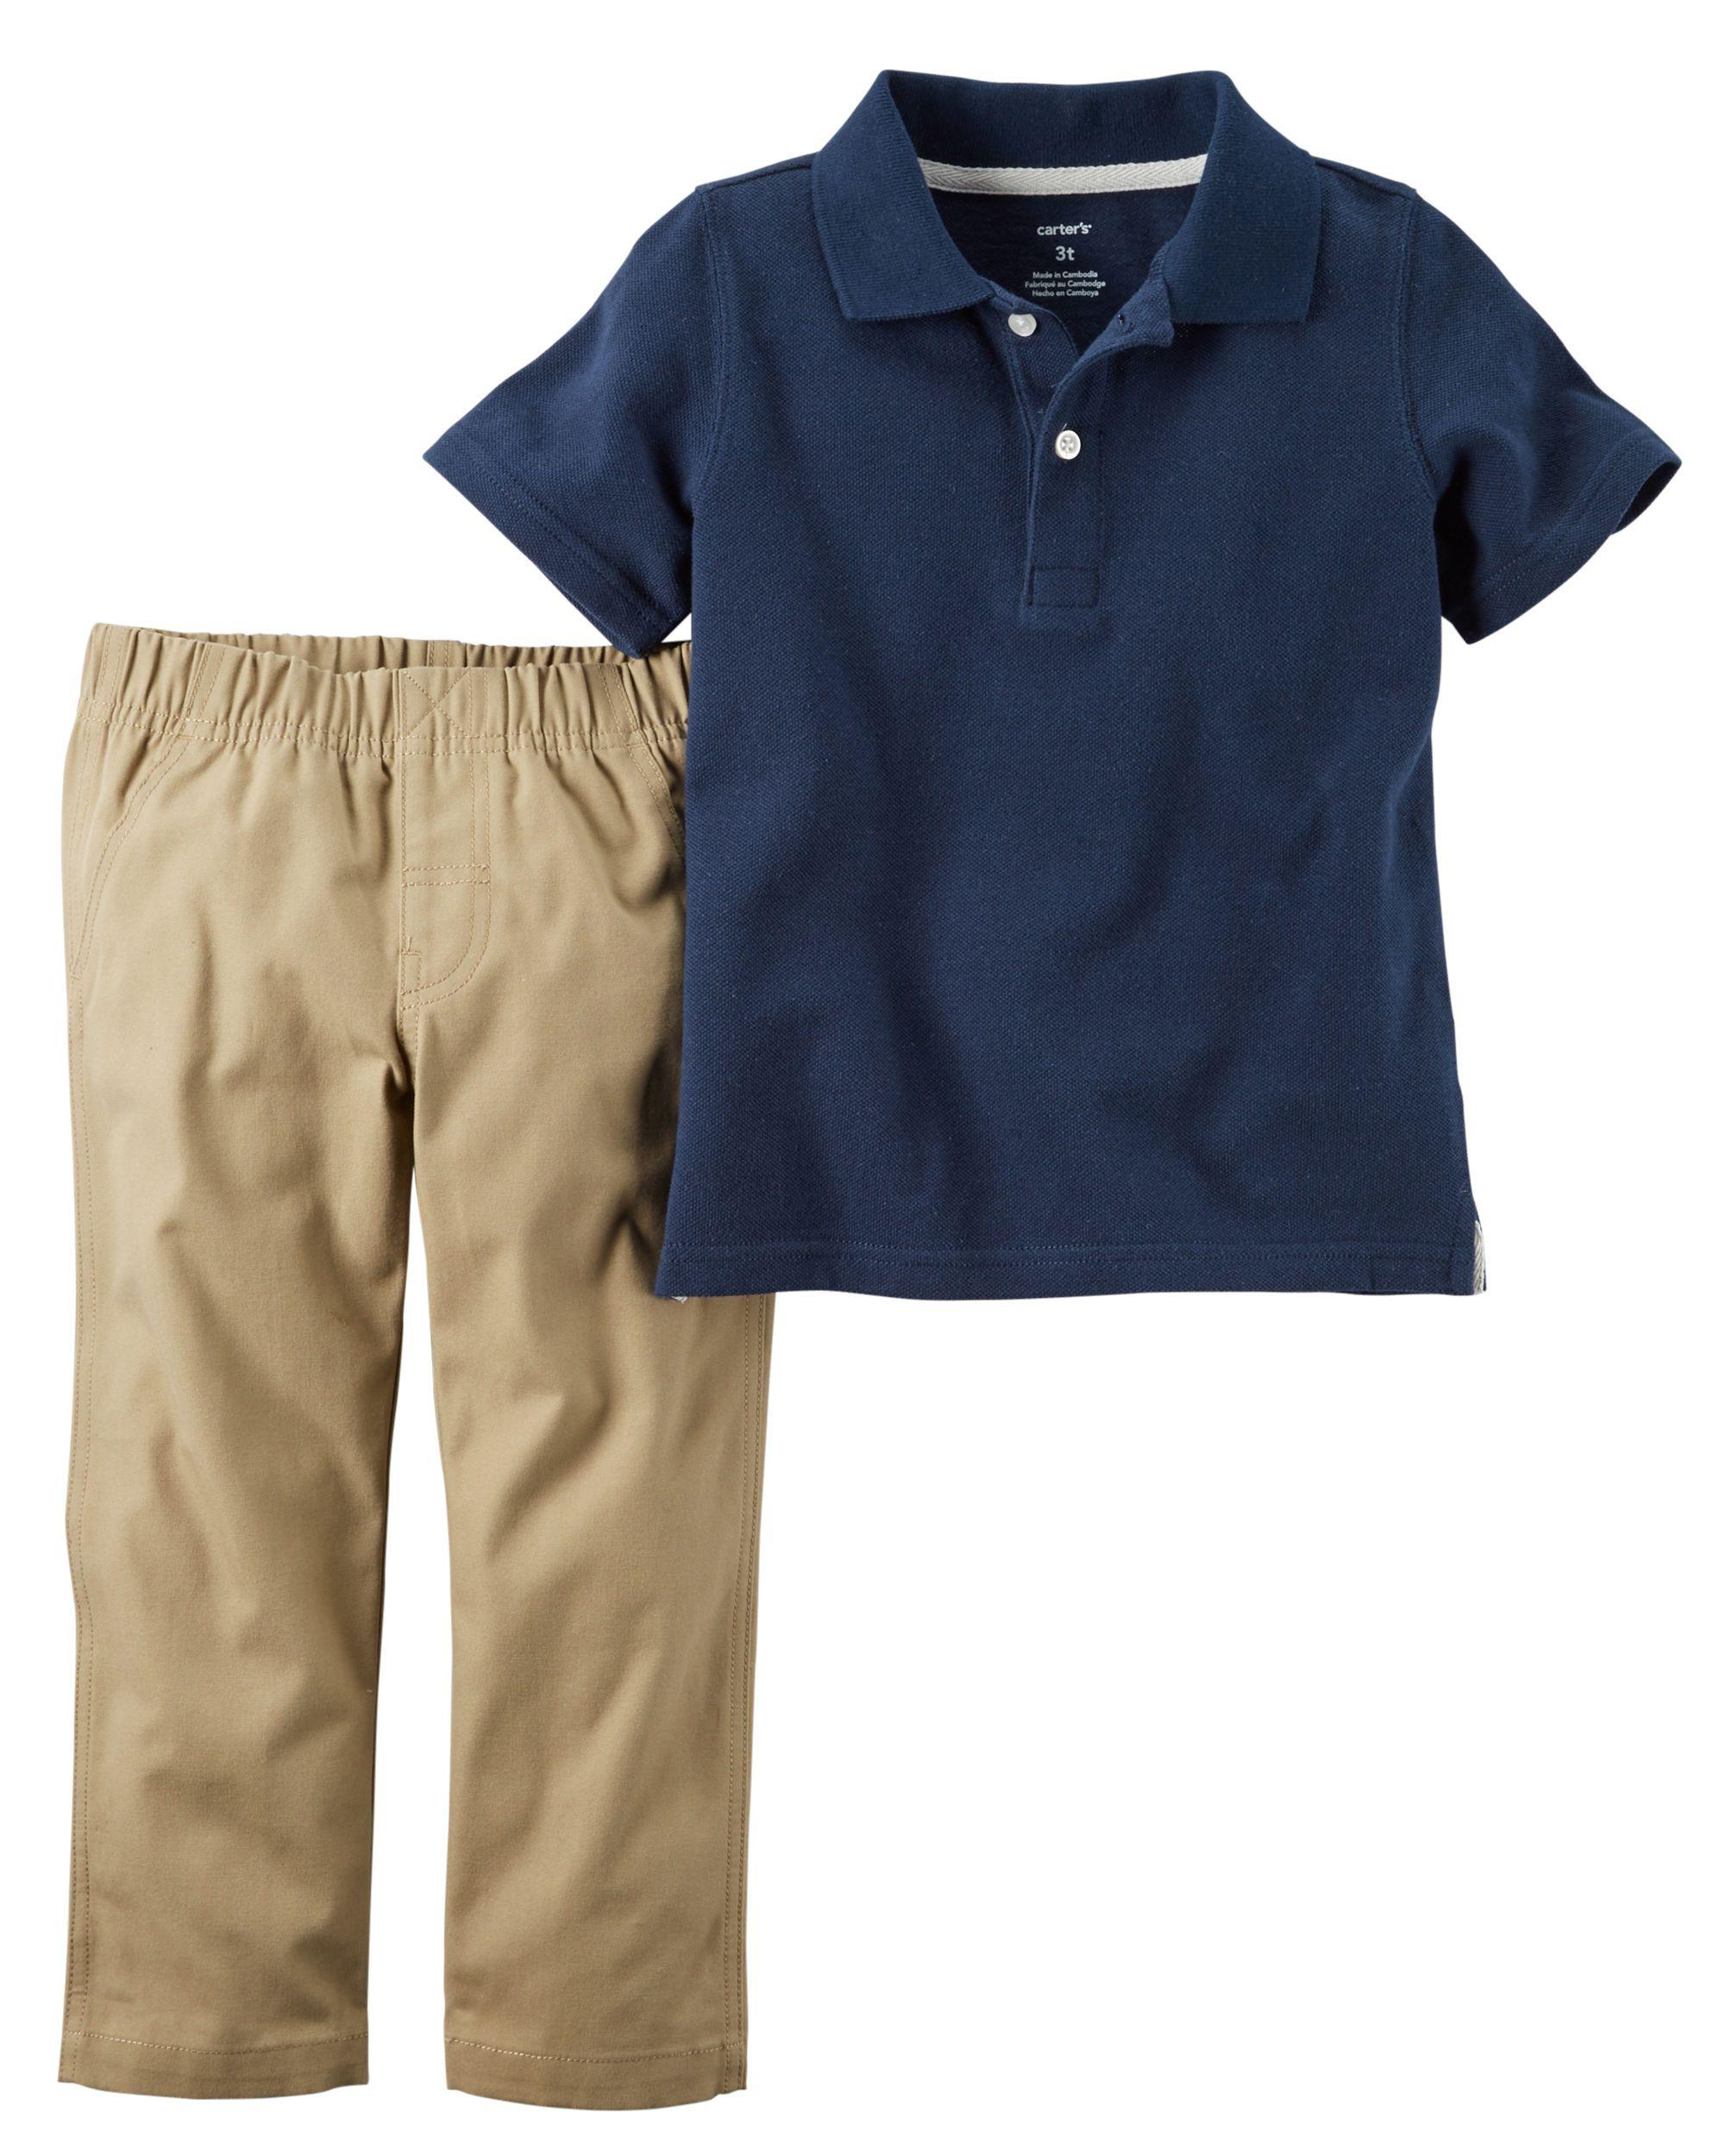 9628f3c968caf Toddler Boy 2-Piece Polo & Pant Uniform Set | Carters.com | BRYANT ...